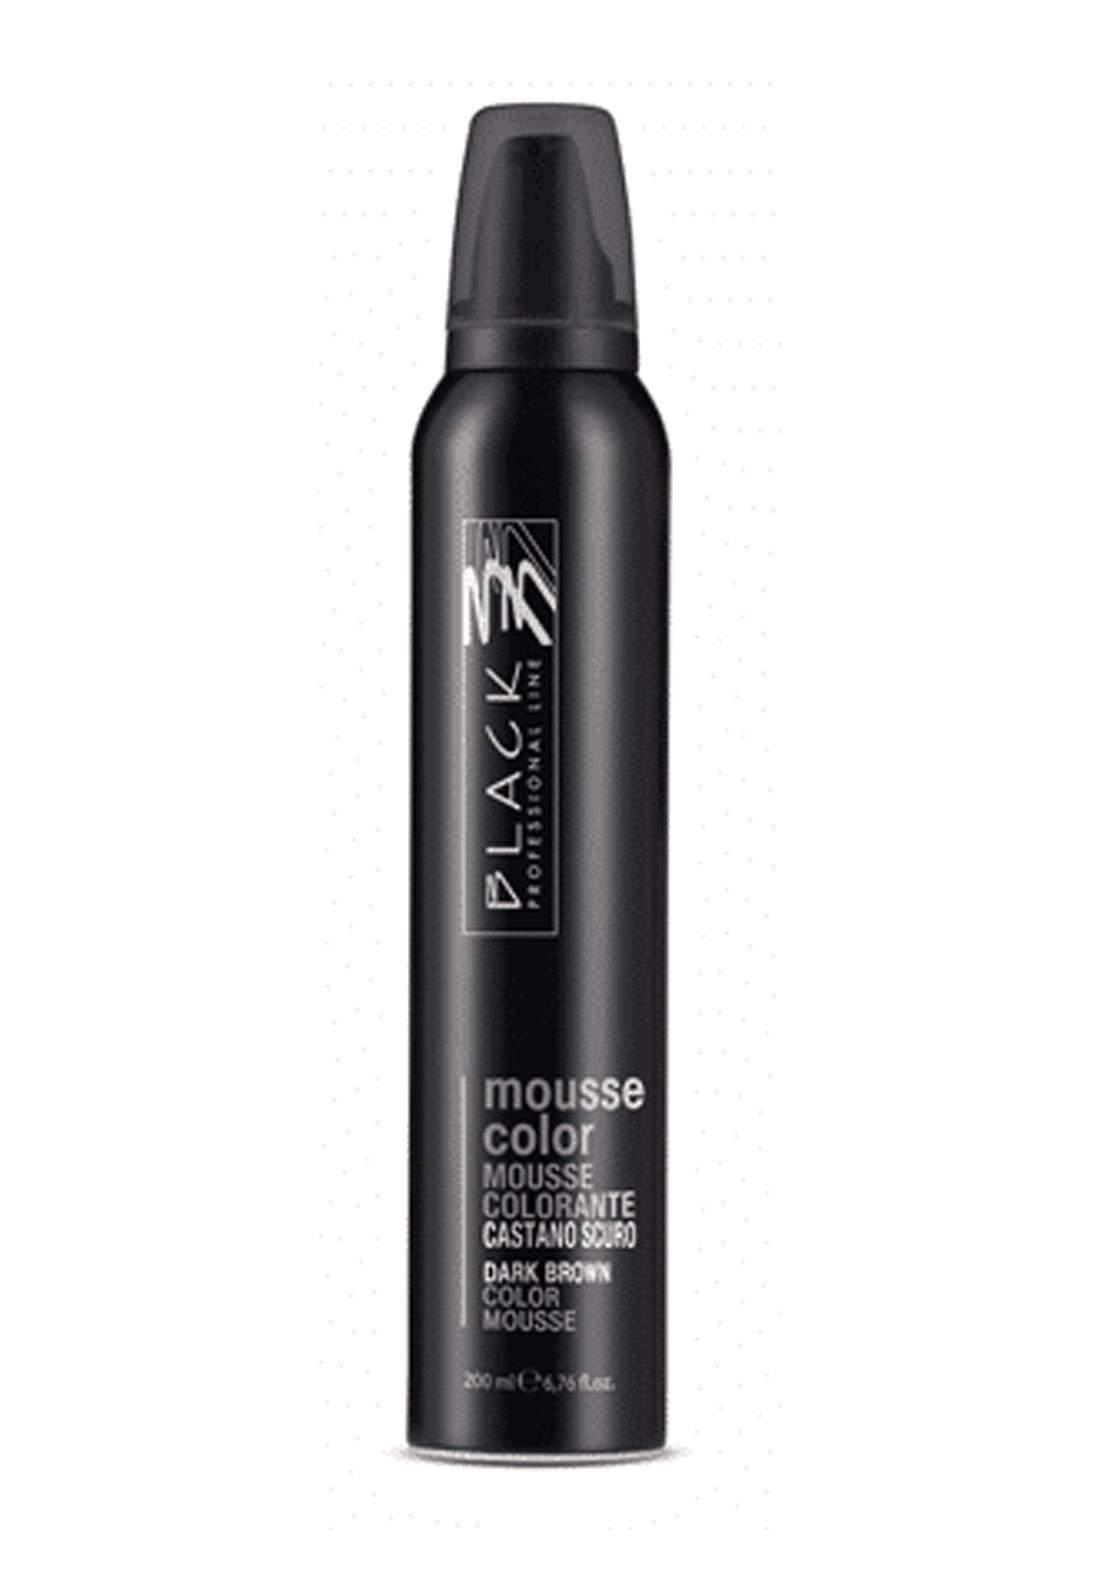 Black Mousse Color Protective Coloring 200ml Dark Brown  موس حماية اللون